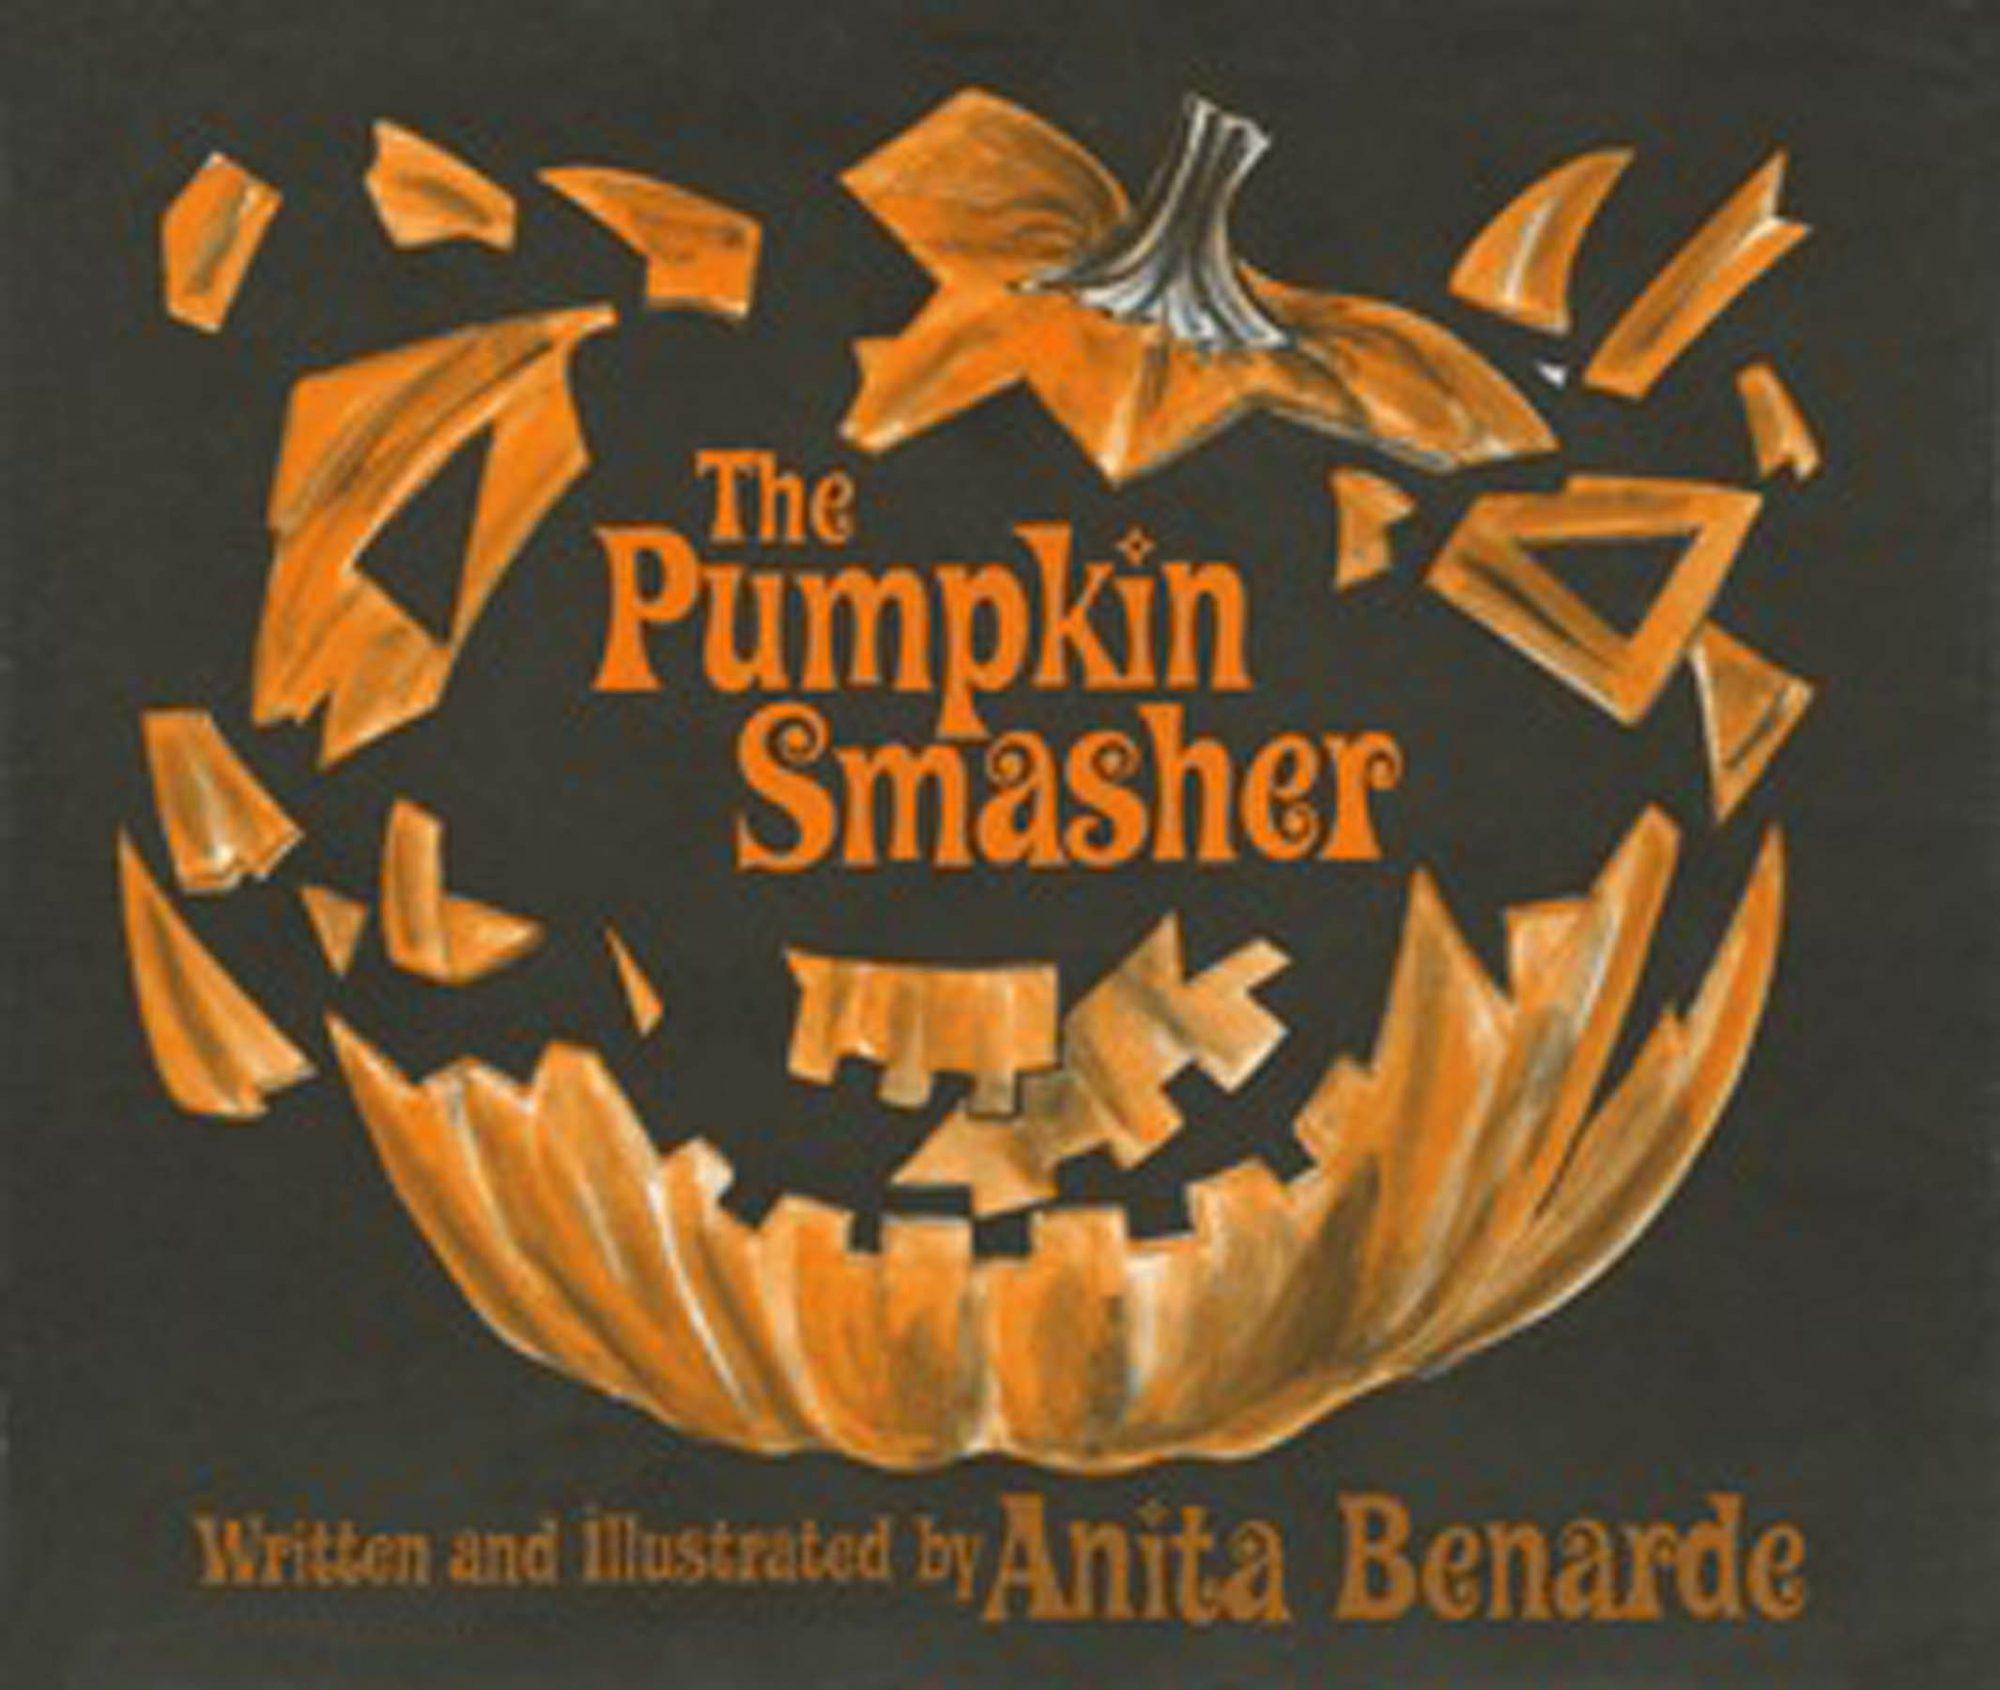 The Pumpkin SmasherBy Anita Bernarde